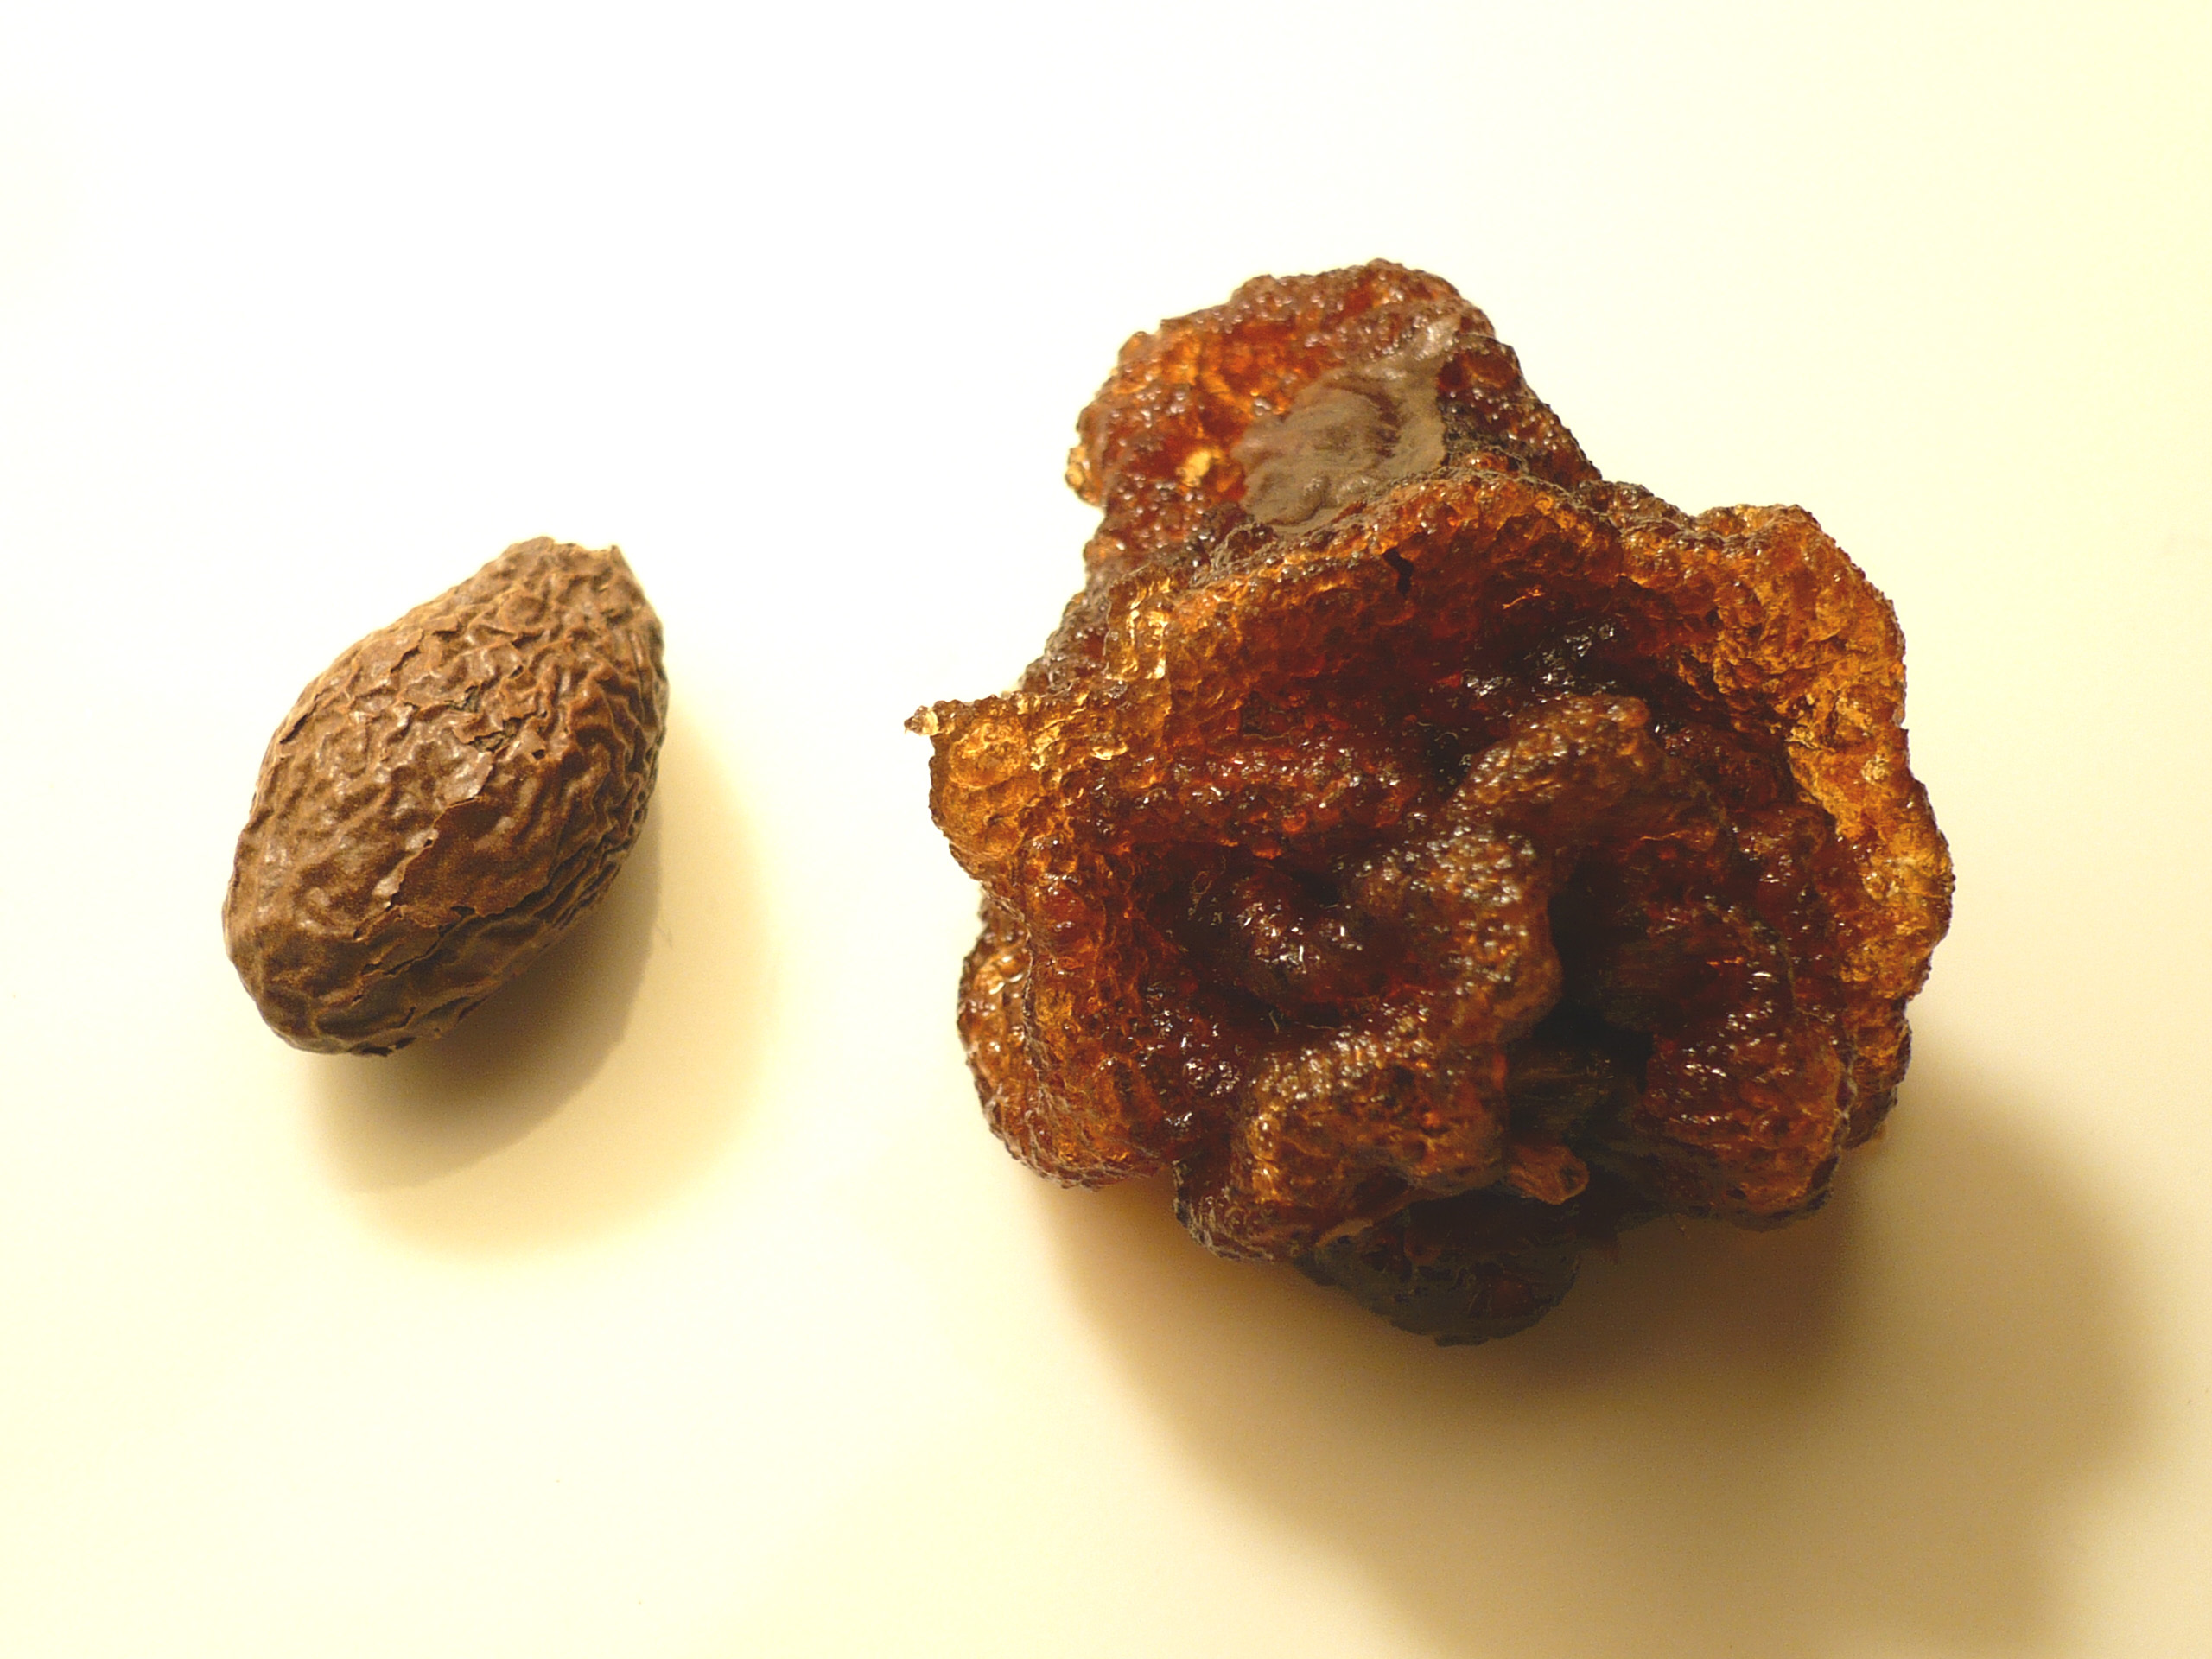 http://upload.wikimedia.org/wikipedia/commons/a/a6/Sterculia_lychnophora_seed.jpg